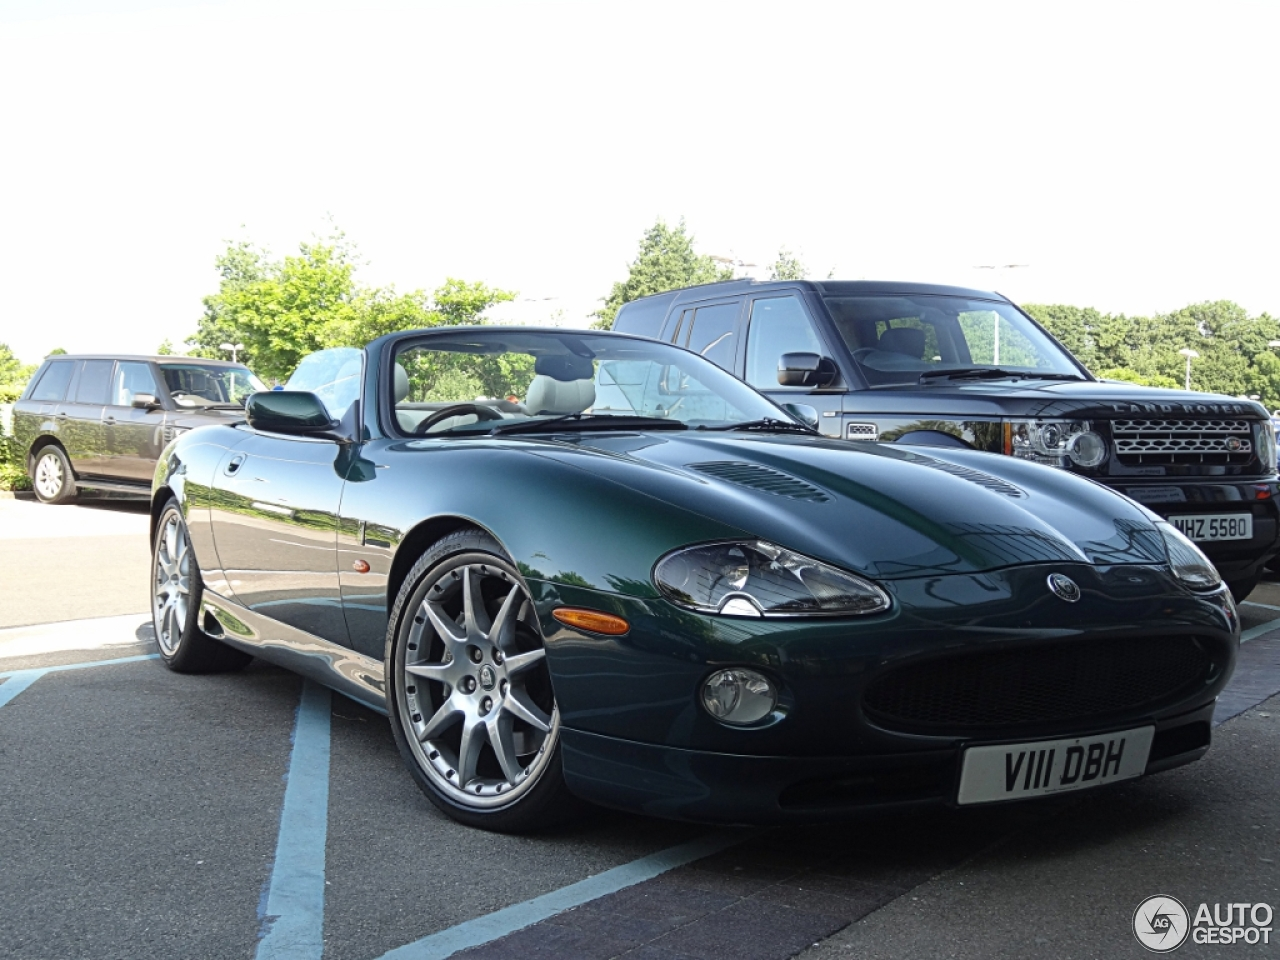 Jaguar Arden Xkr Convertible 14 July 2013 Autogespot